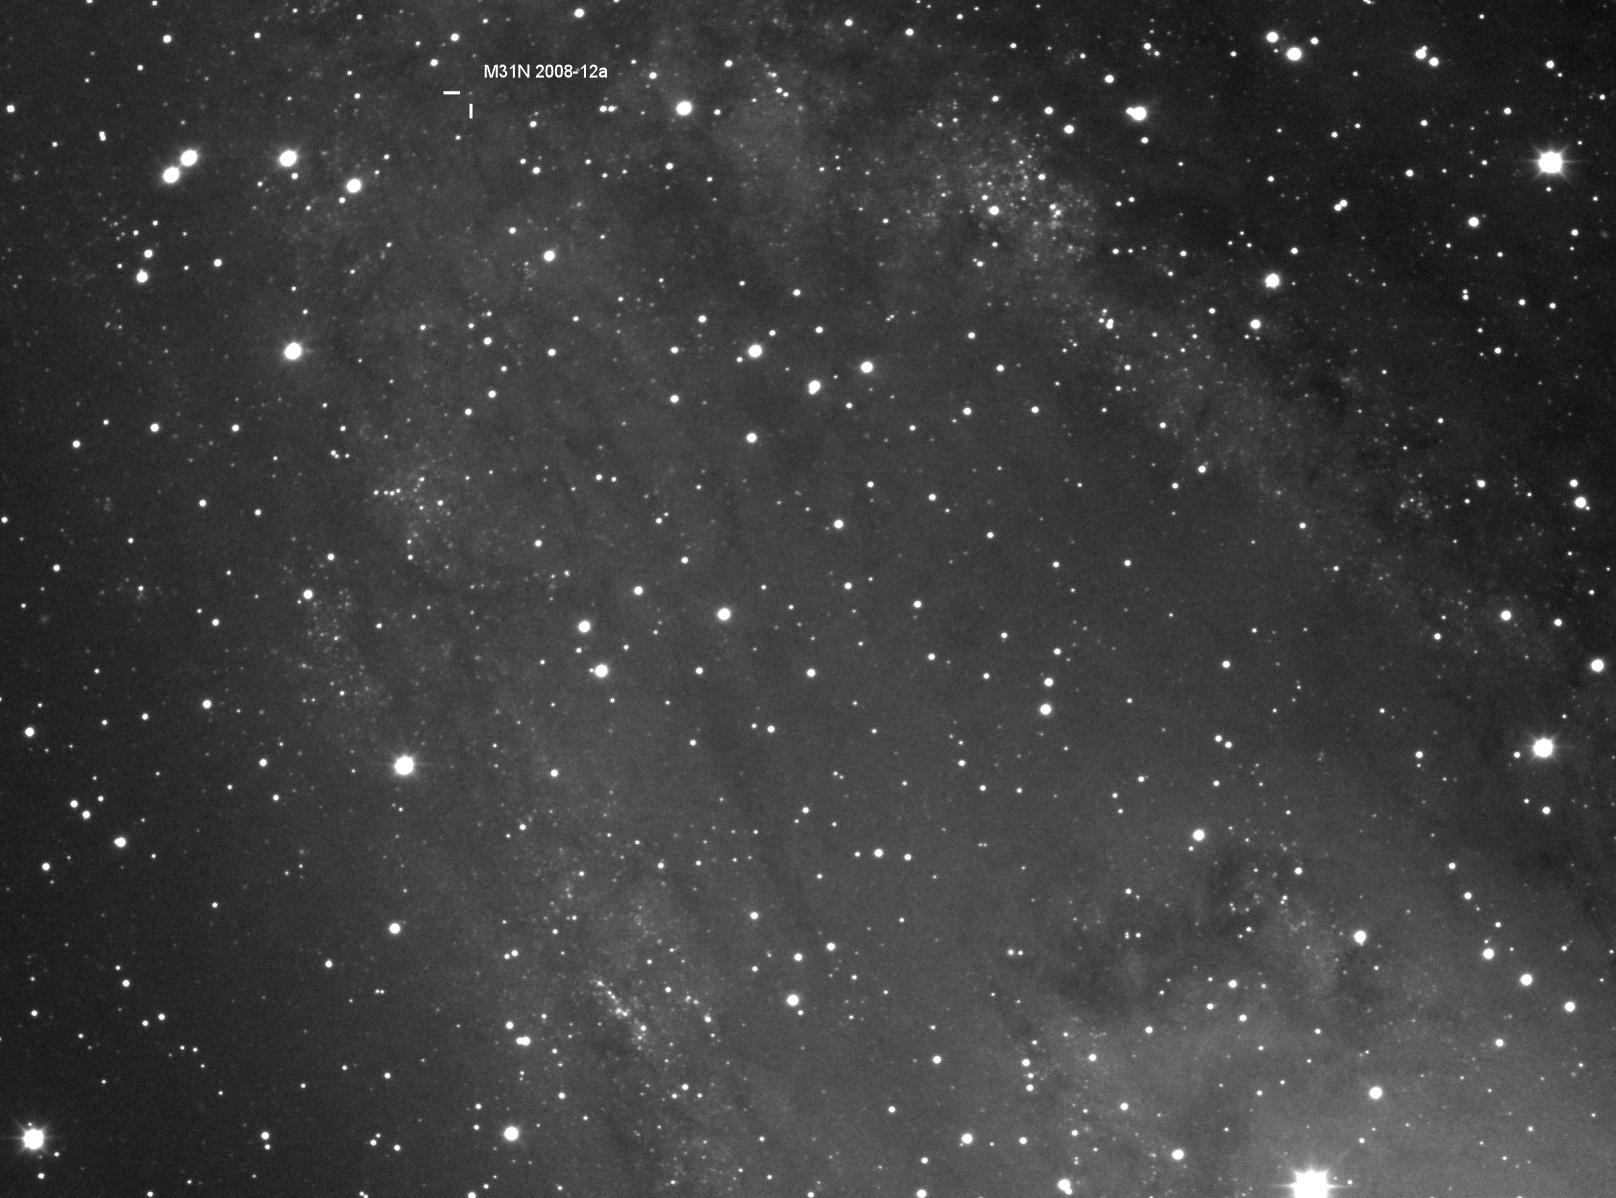 m31_191106.jpg.6b5b65f744b35b438cd85d43f1ac69f1.jpg